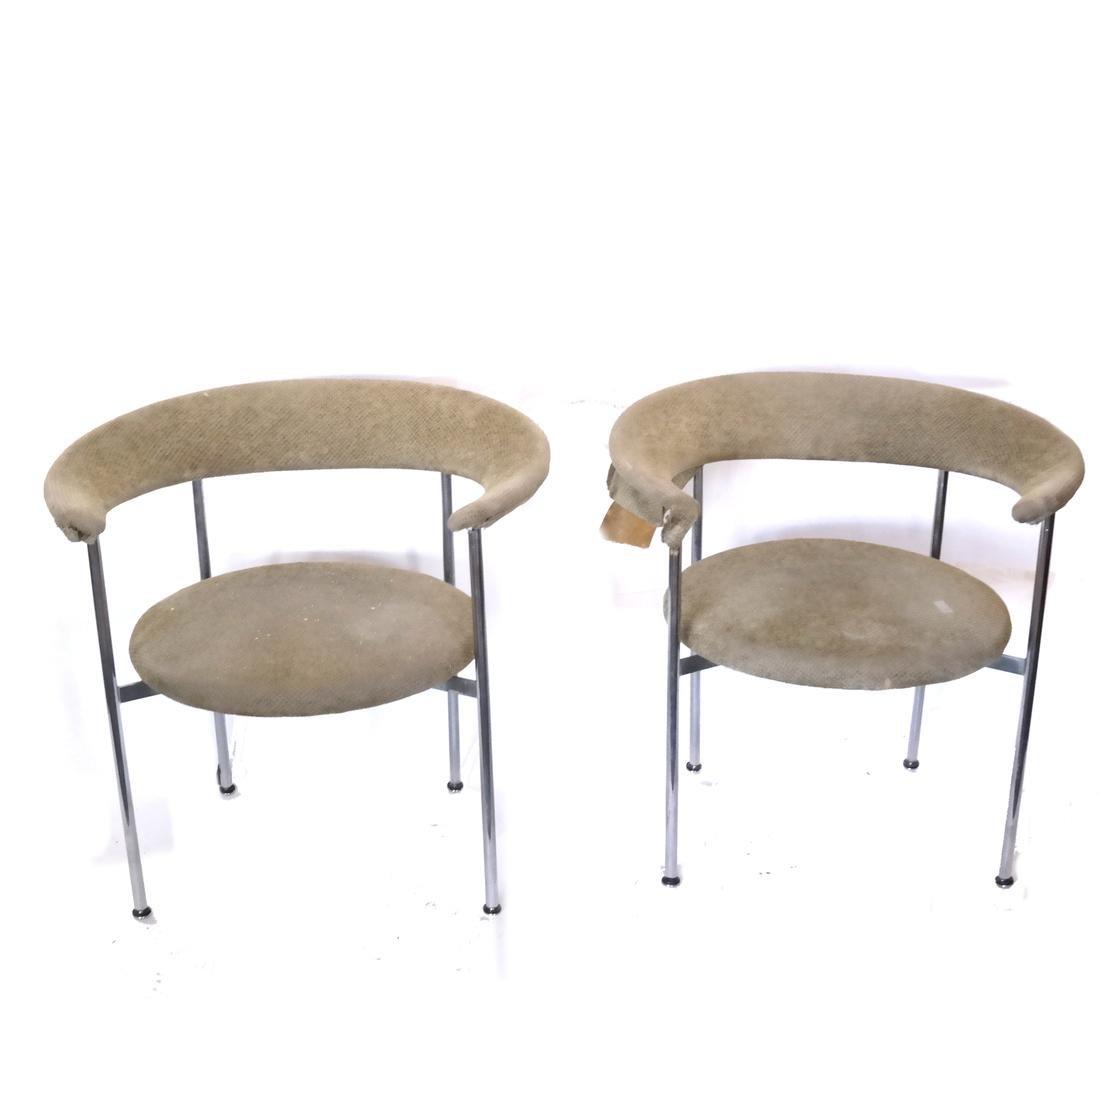 Pair of Modern Chrome Chairs